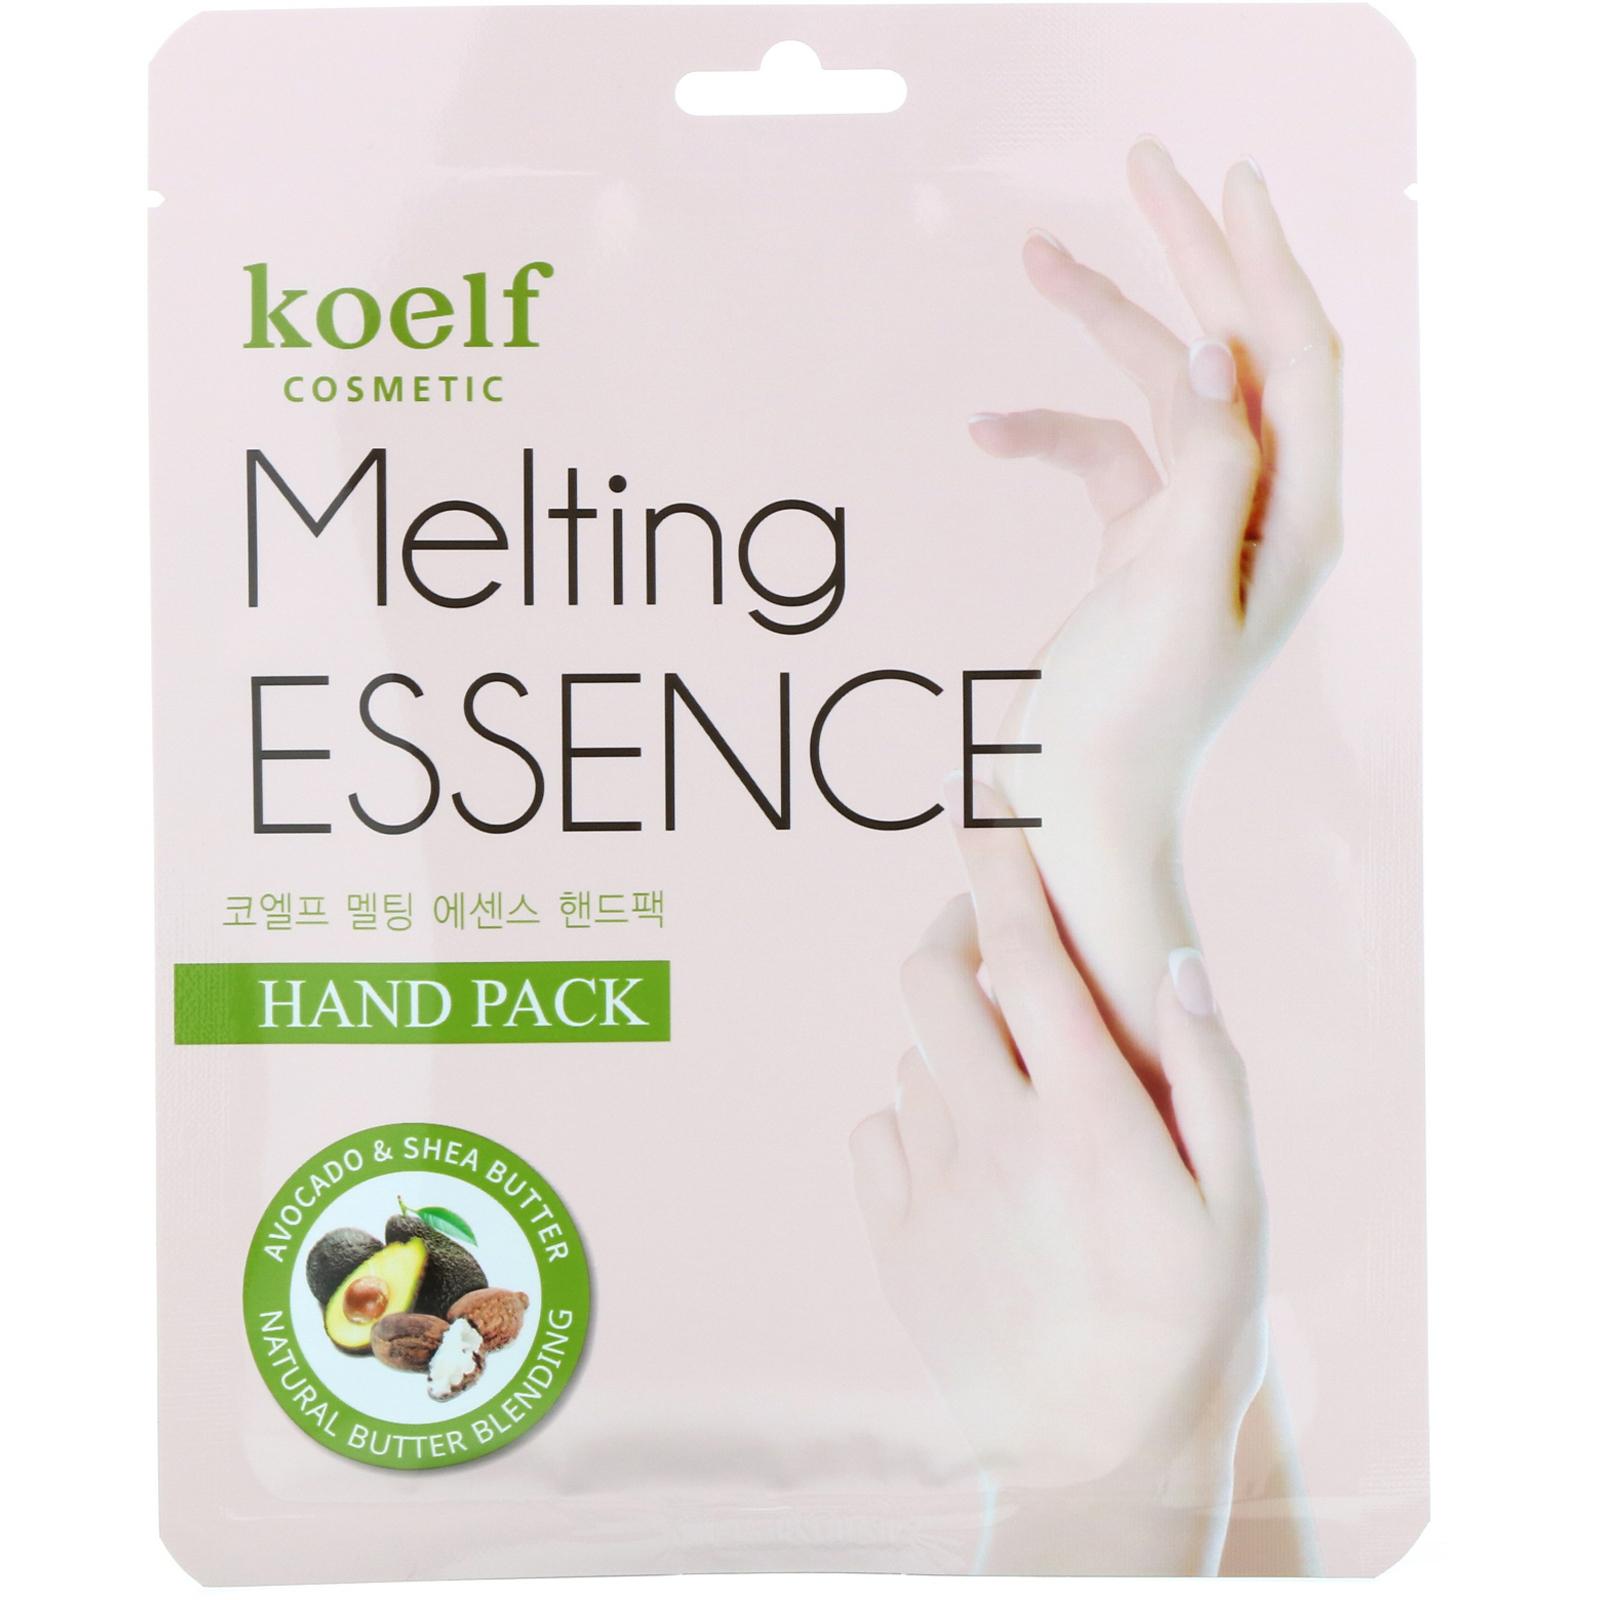 Koelf Melting Essence ماسك اليدين 10 أزواج من القفازات Iherb